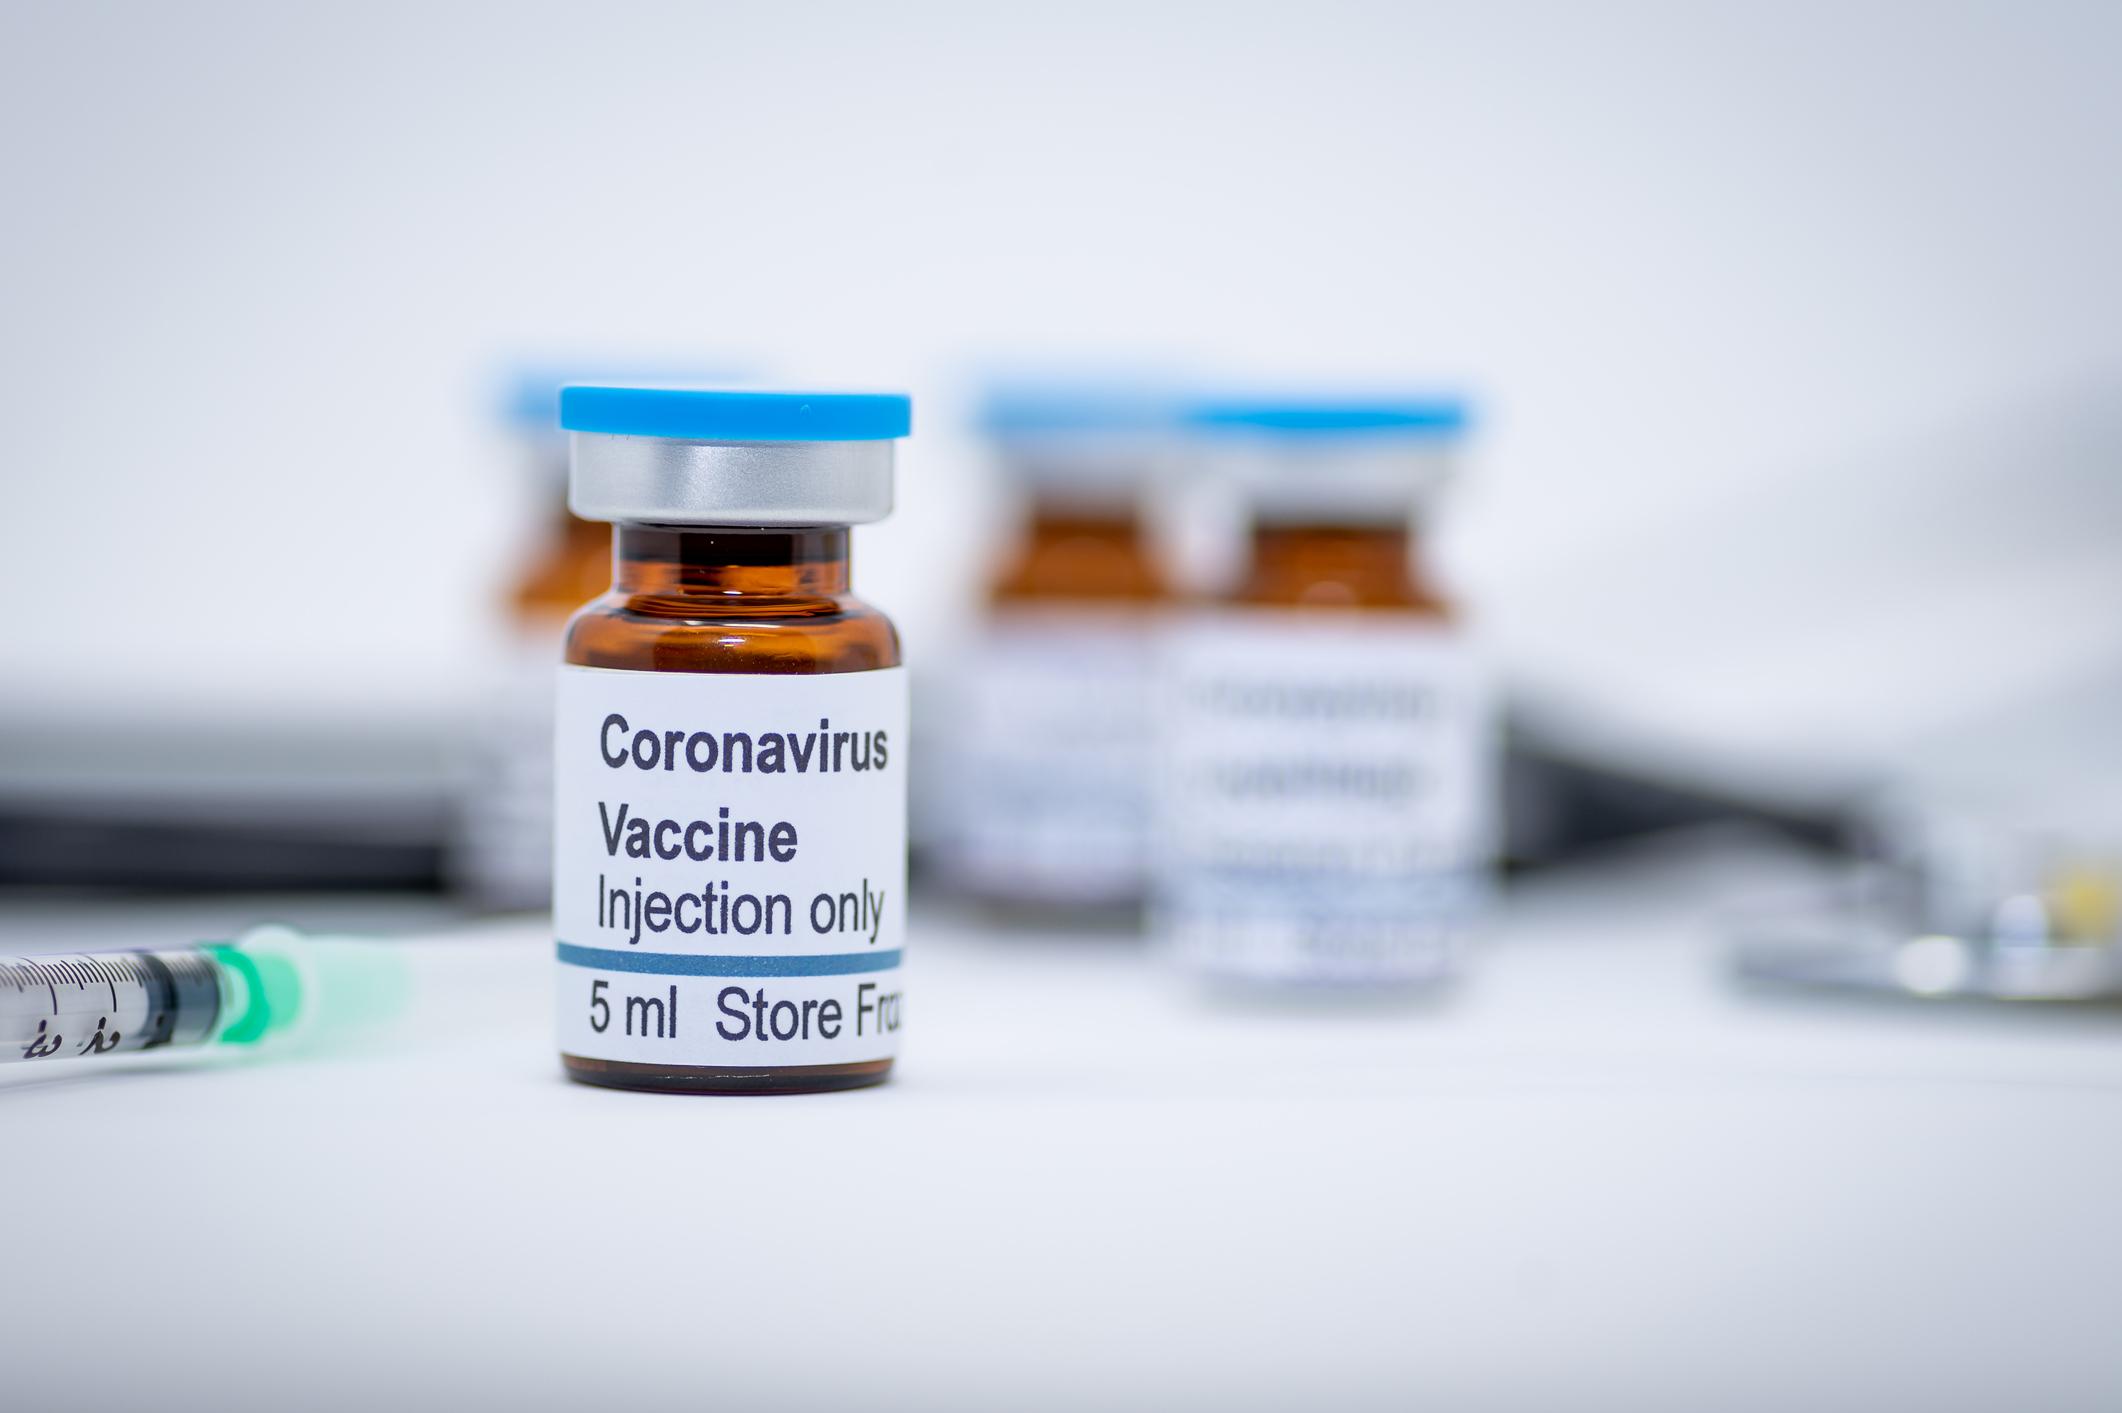 Johnson & Johnson Announces Partnership With U.S. government to Accelerate Coronavirus Vaccine Development | The Motley Fool